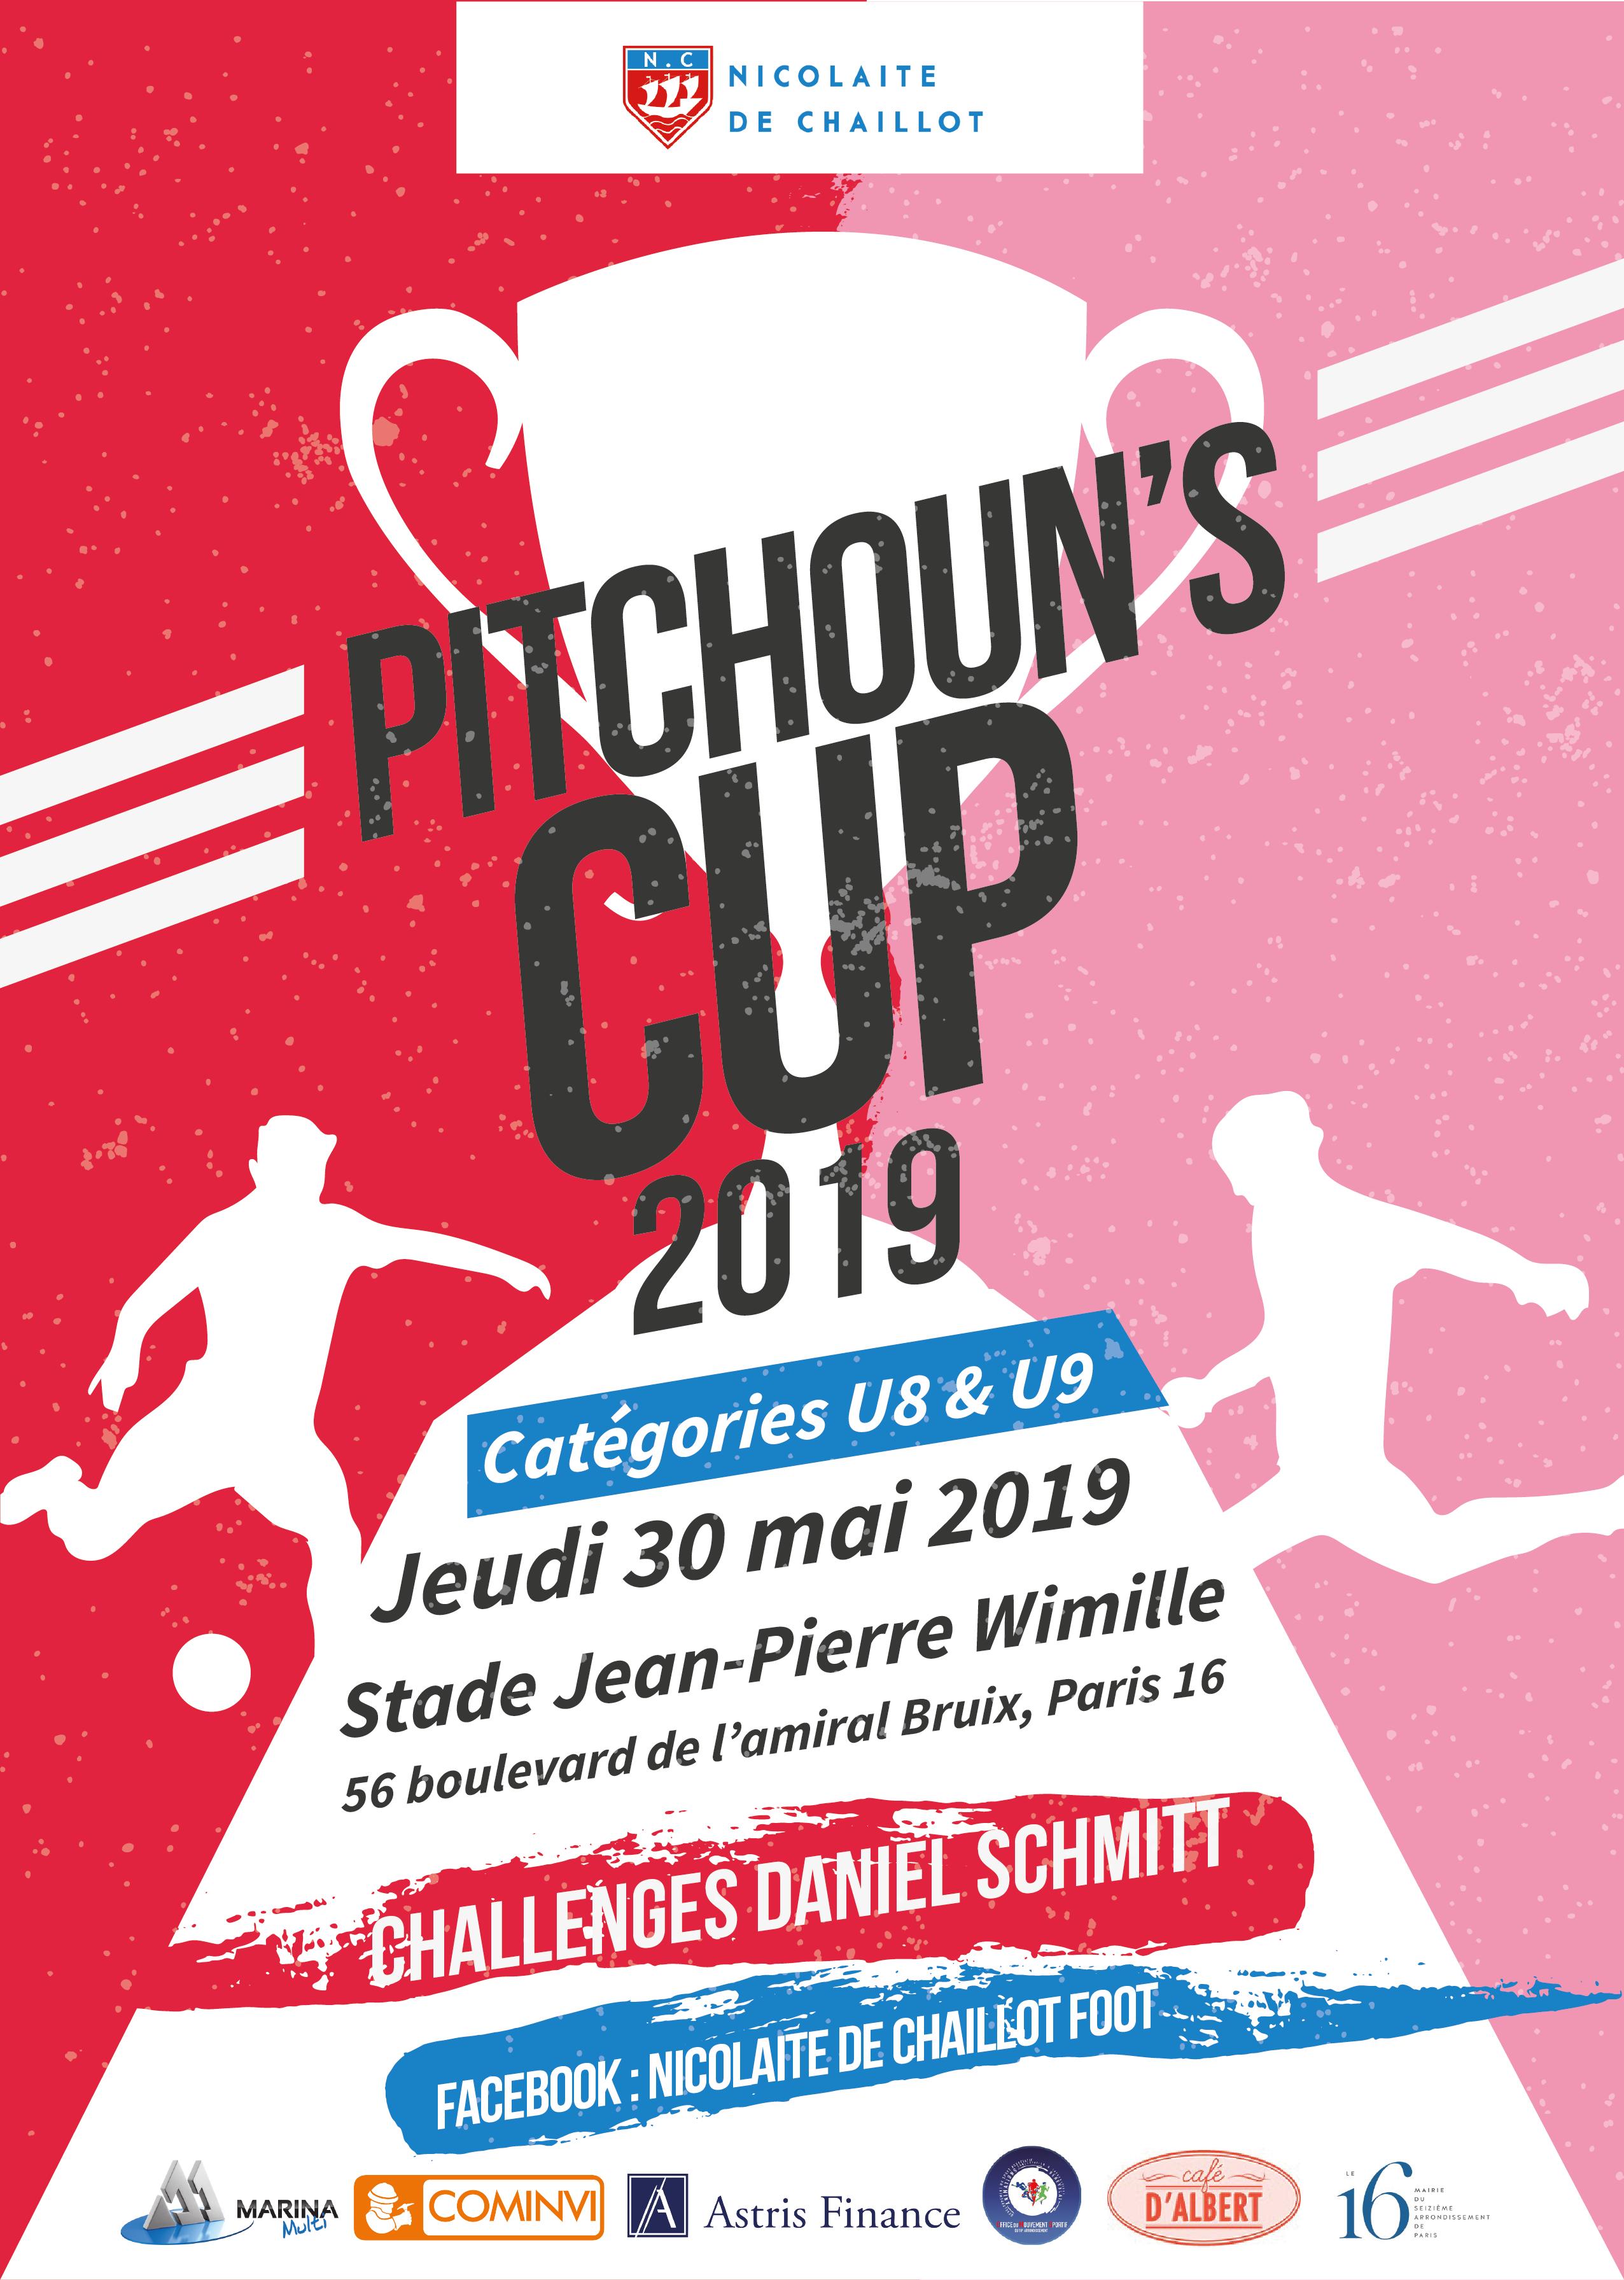 Pitchoun's cup 2019 copy